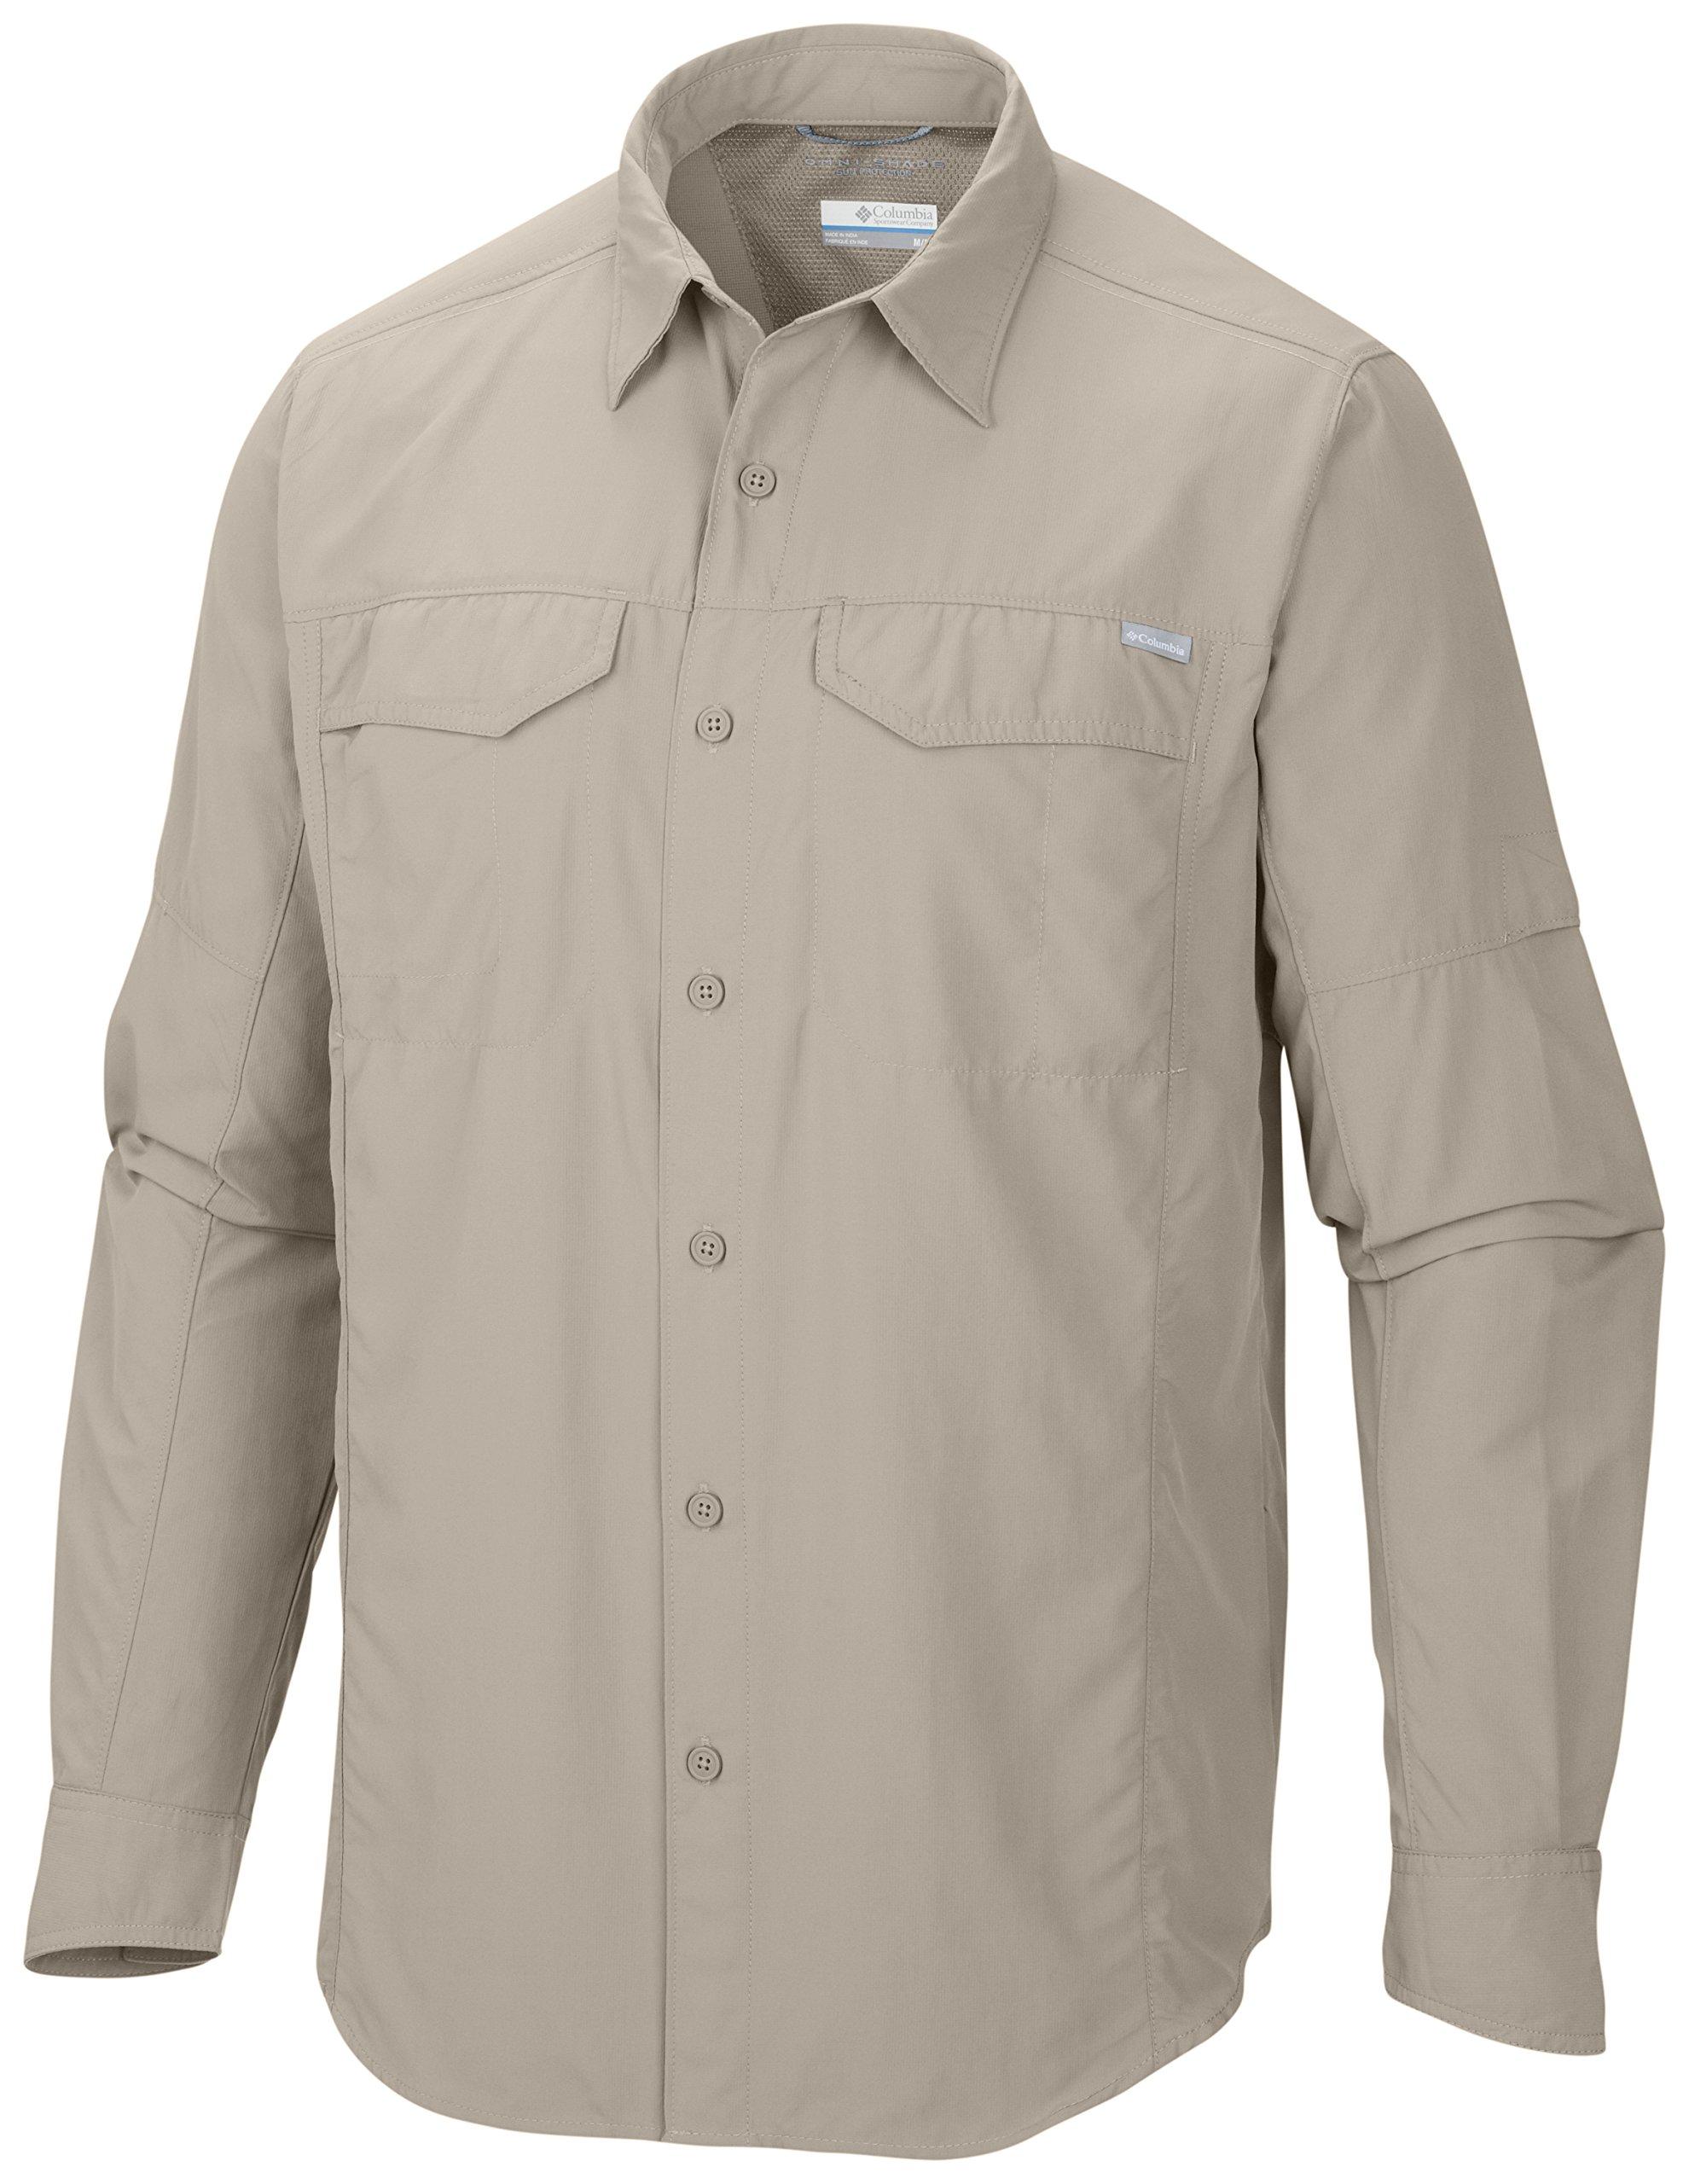 Columbia Silver Ridge Long Sleeve Shirt, Medium, Fossil